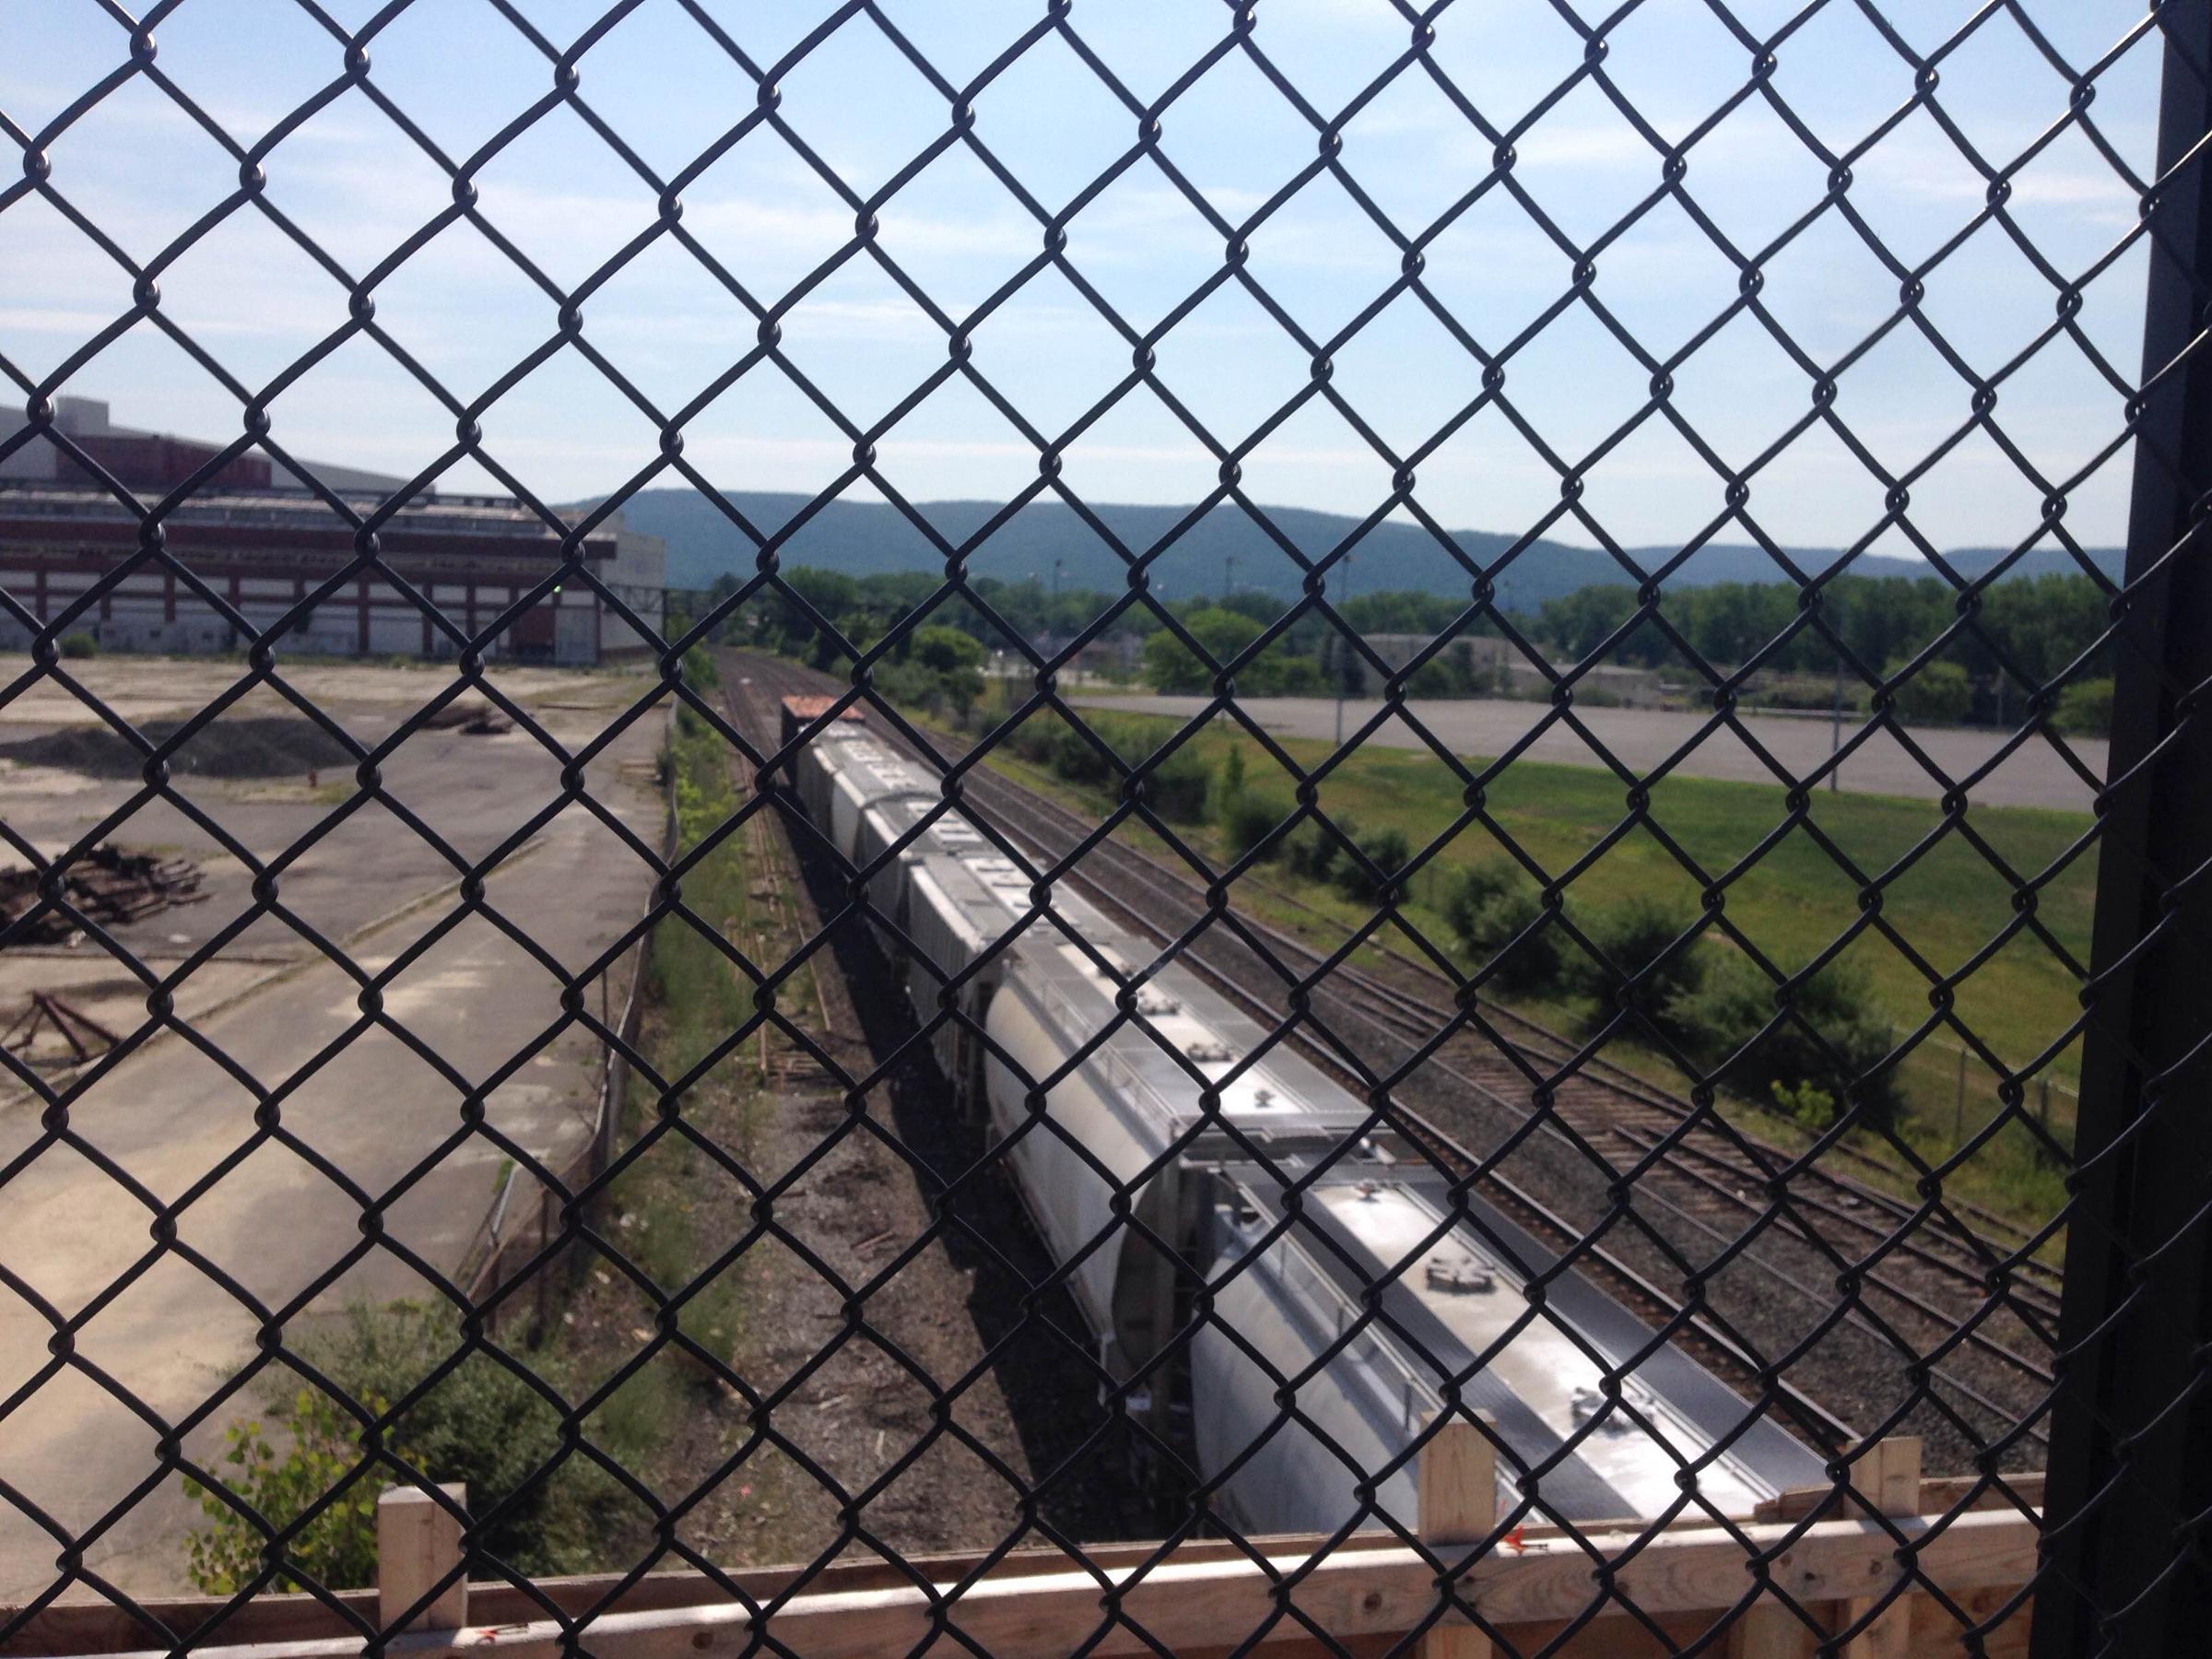 Hints Of Summer Tourism Bring Up NYC-Berkshires Railway | WAMC